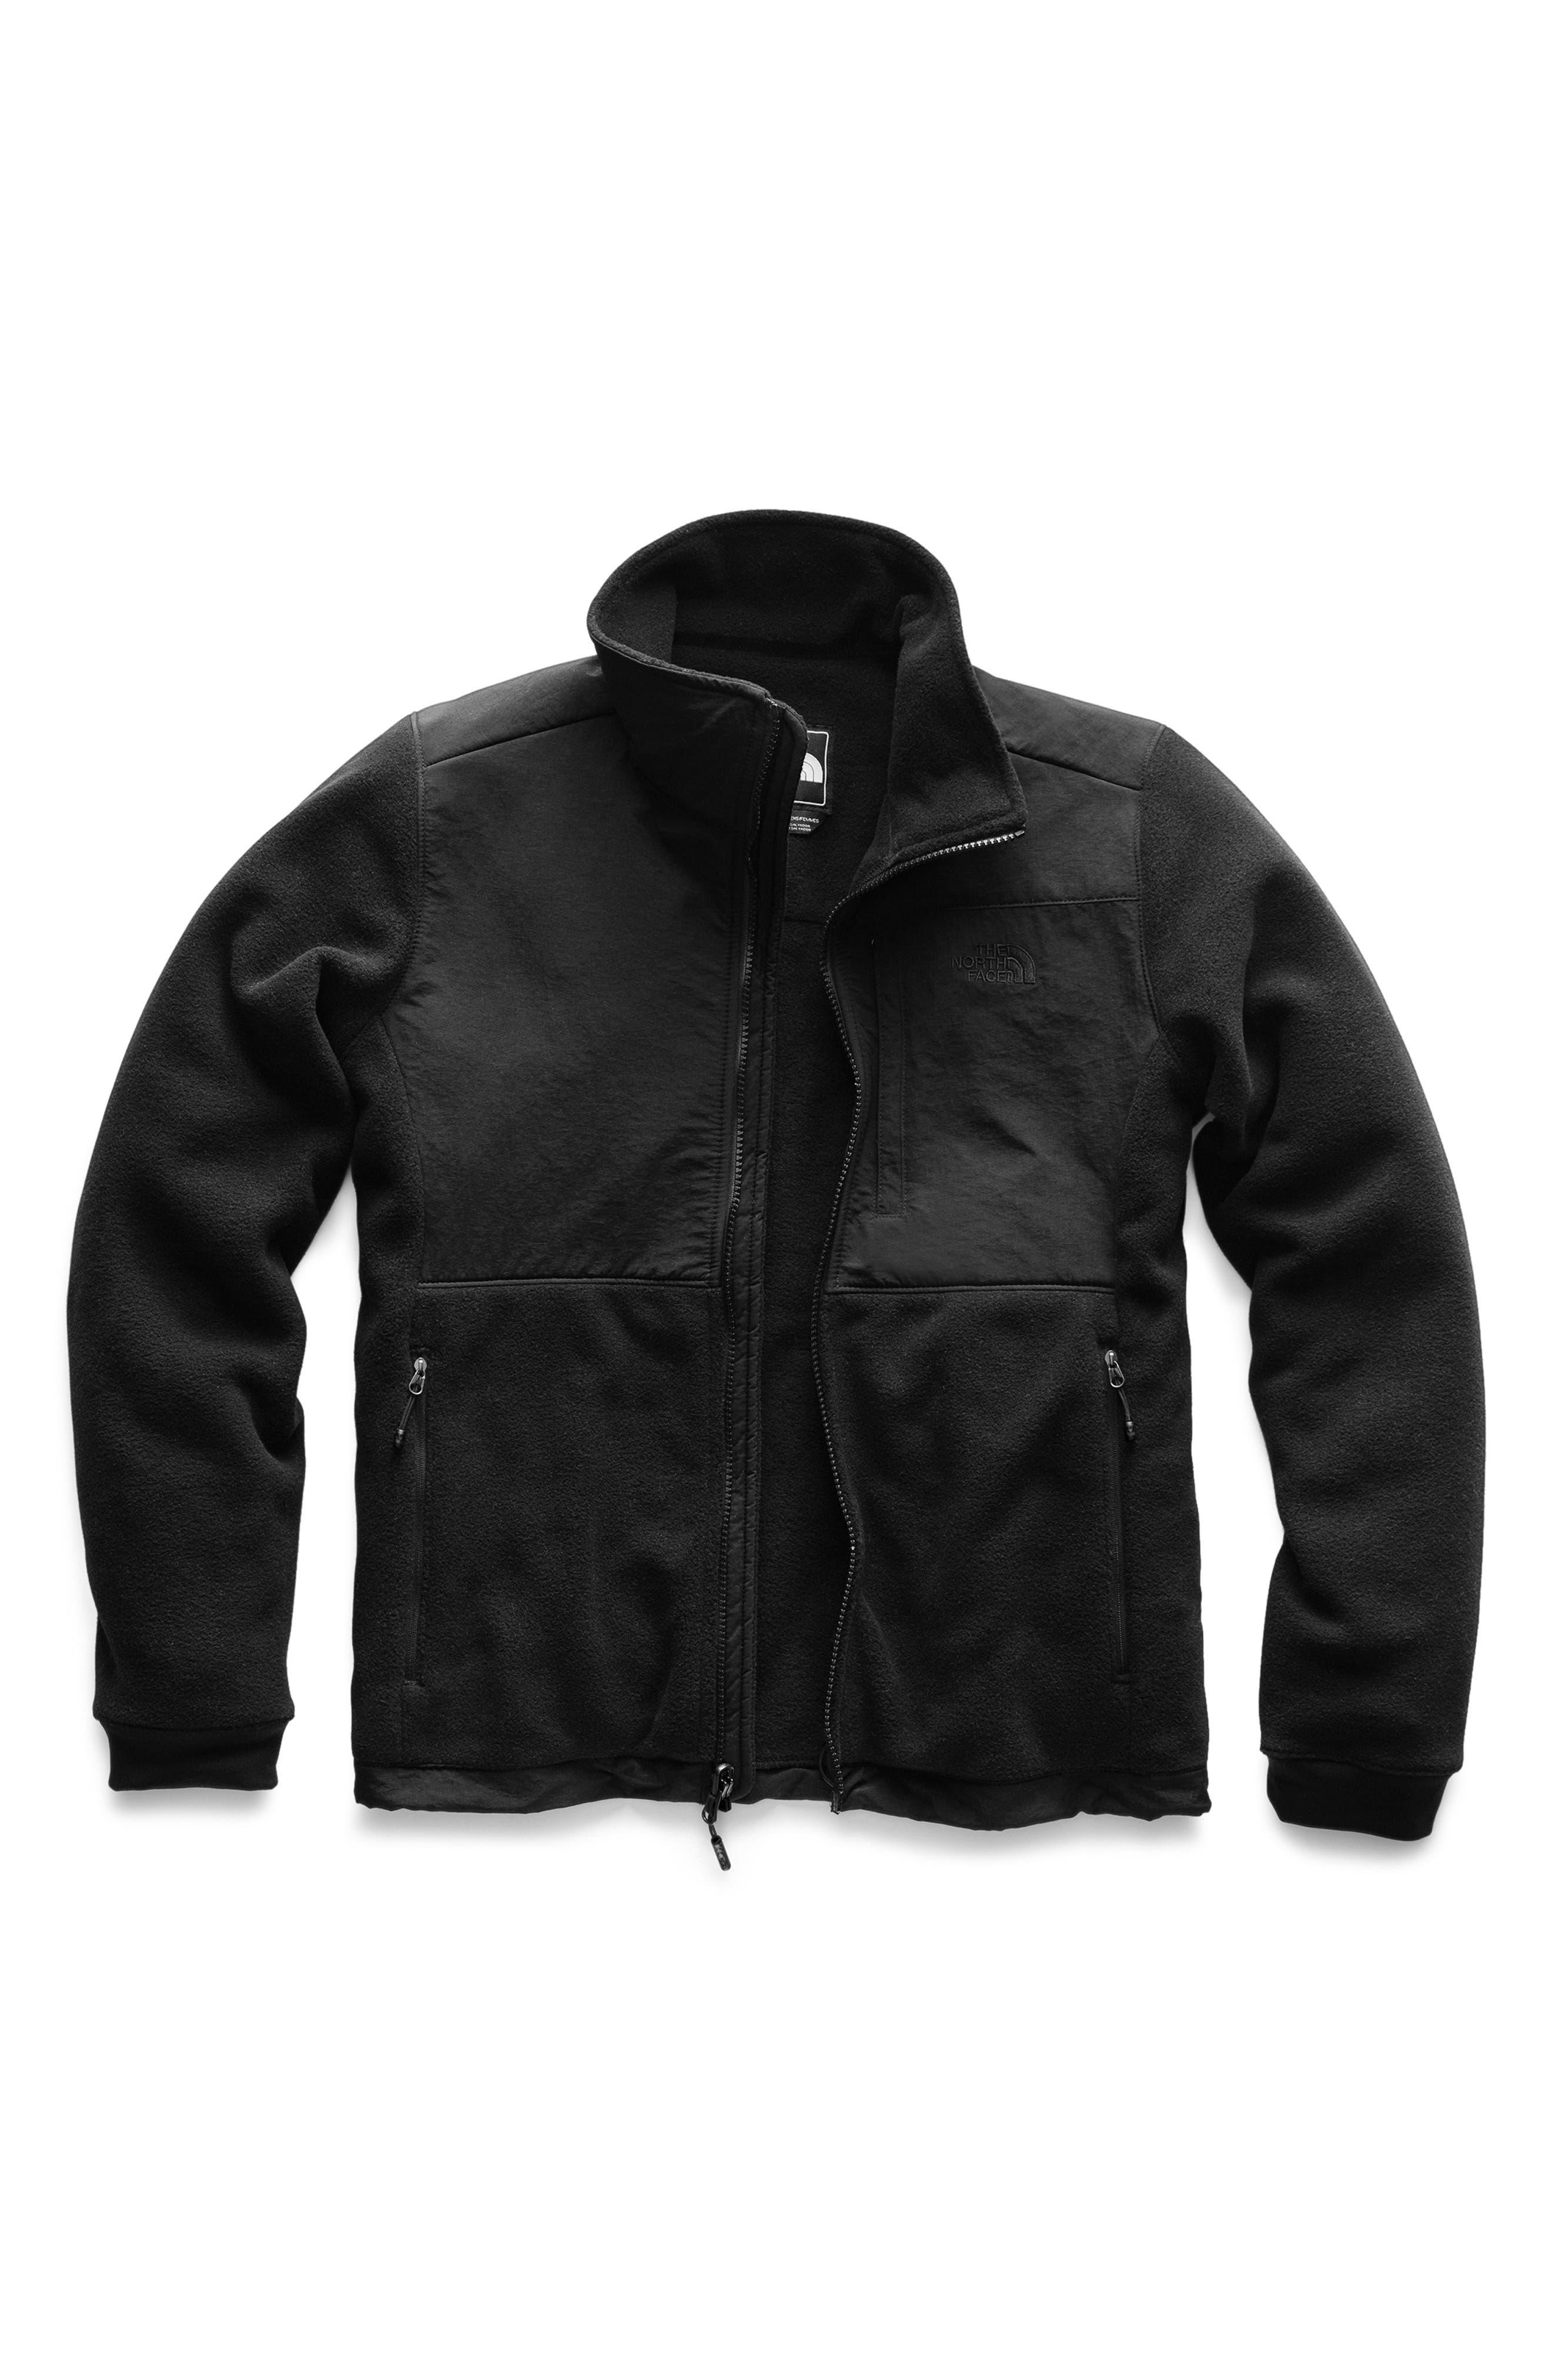 THE NORTH FACE, Denali 2 Jacket, Alternate thumbnail 8, color, TNF BLACK